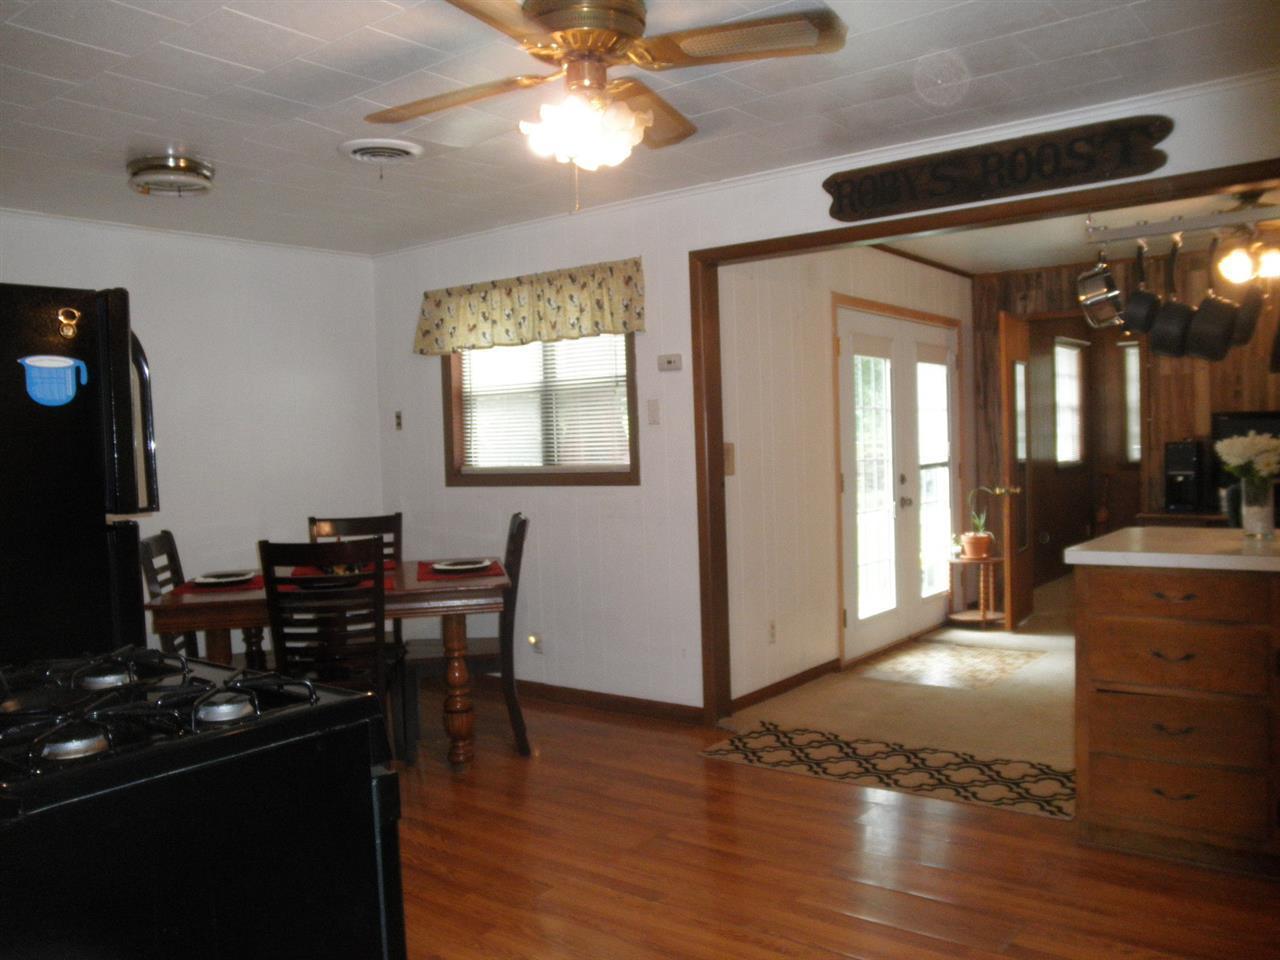 Sold Cross Sale W/ MLS | 808 Gray  Ponca City, OK 74604 6